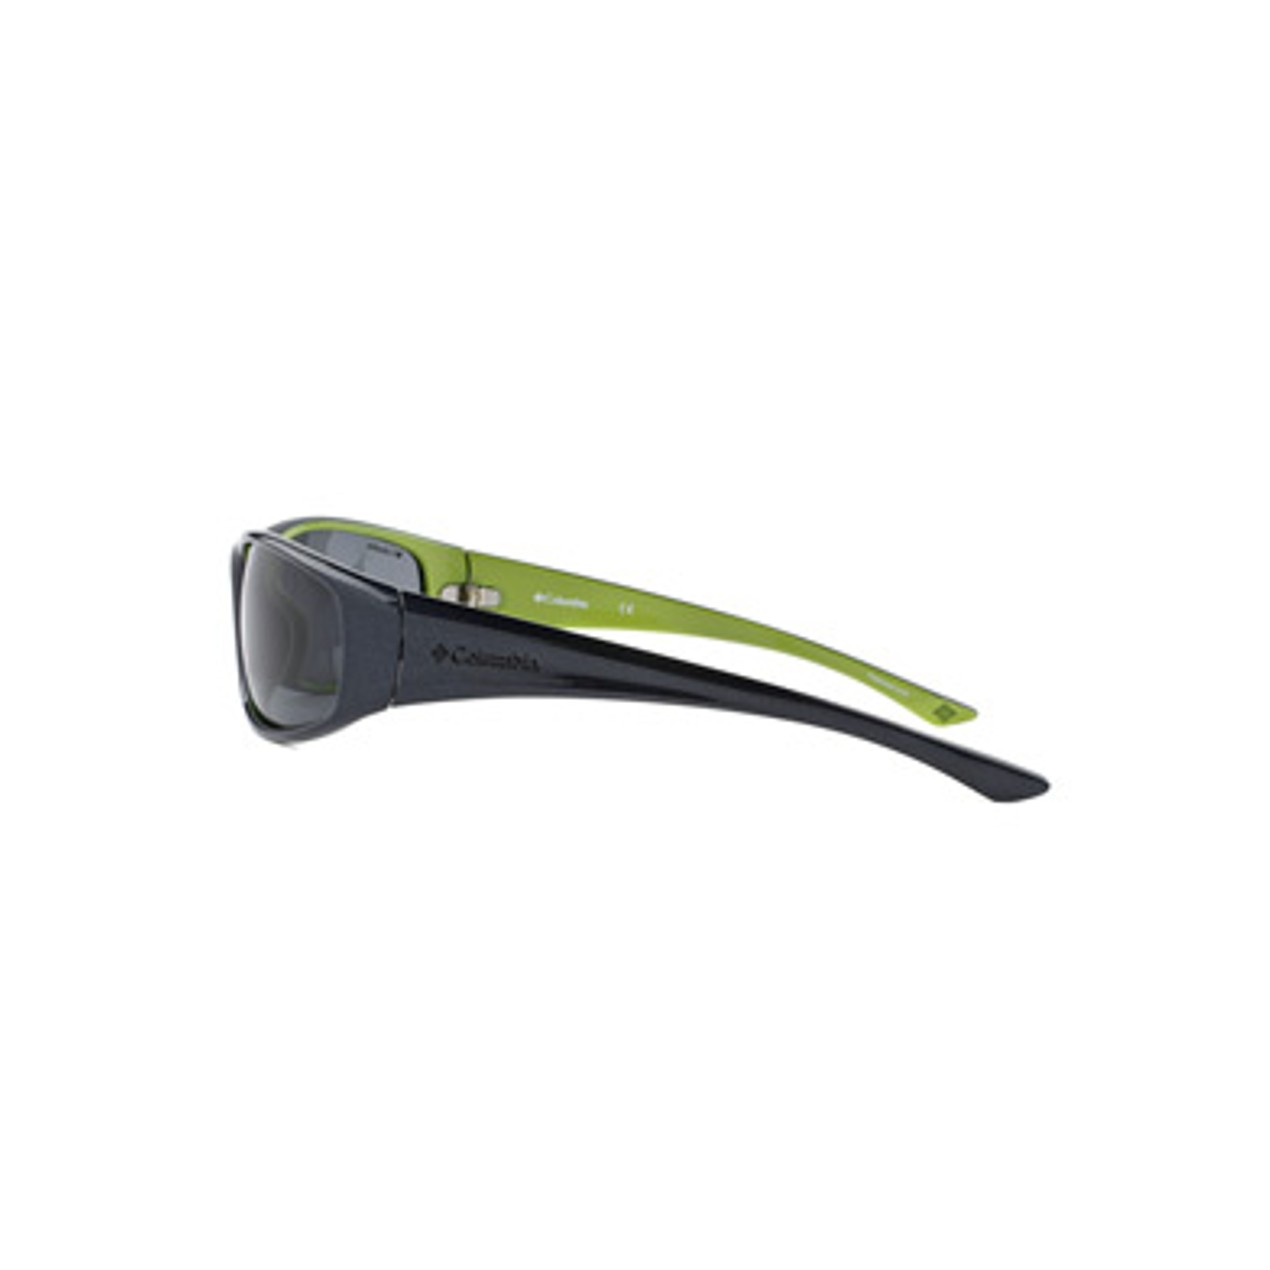 2877c84b1b48 Columbia Borrego Sport Sunglasses - Gray & Lime Green - Tanga